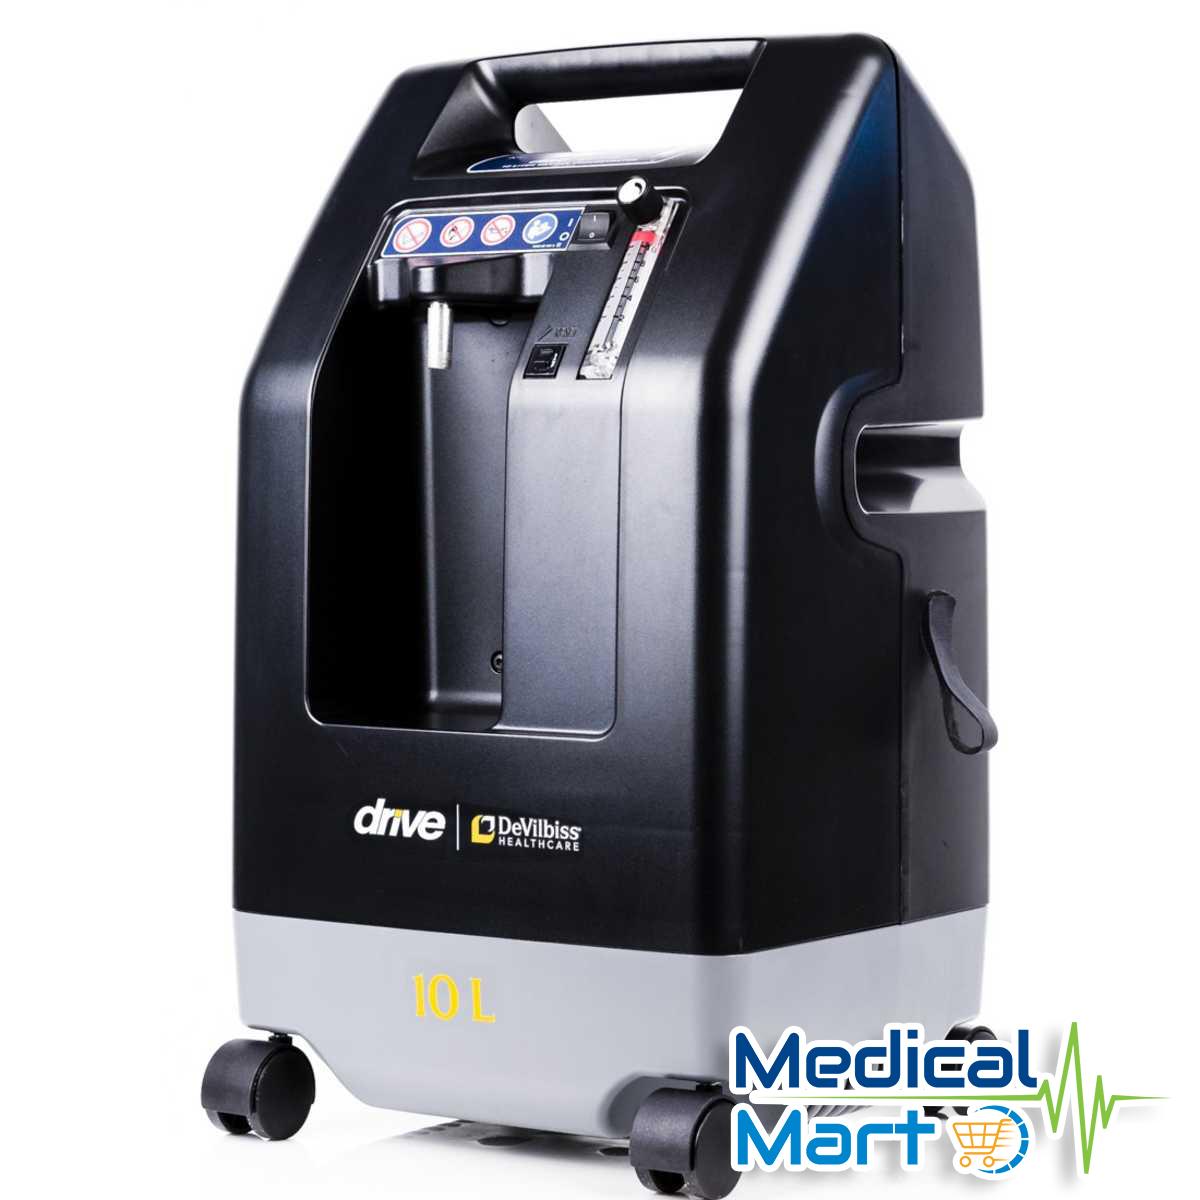 Devilbis 10l Oxygen Concentrator